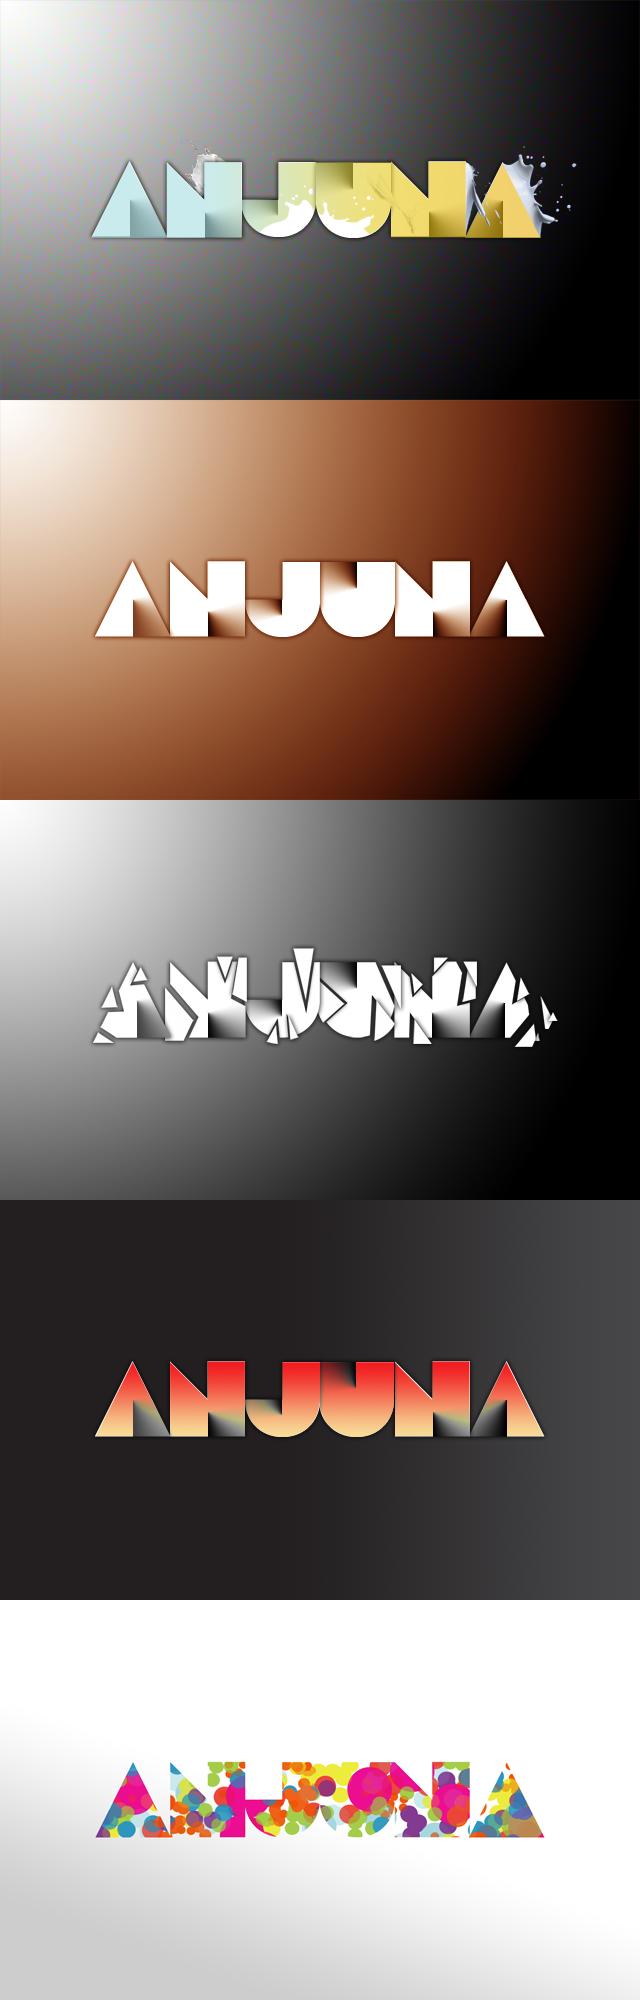 Anjuna v2 by anjuna